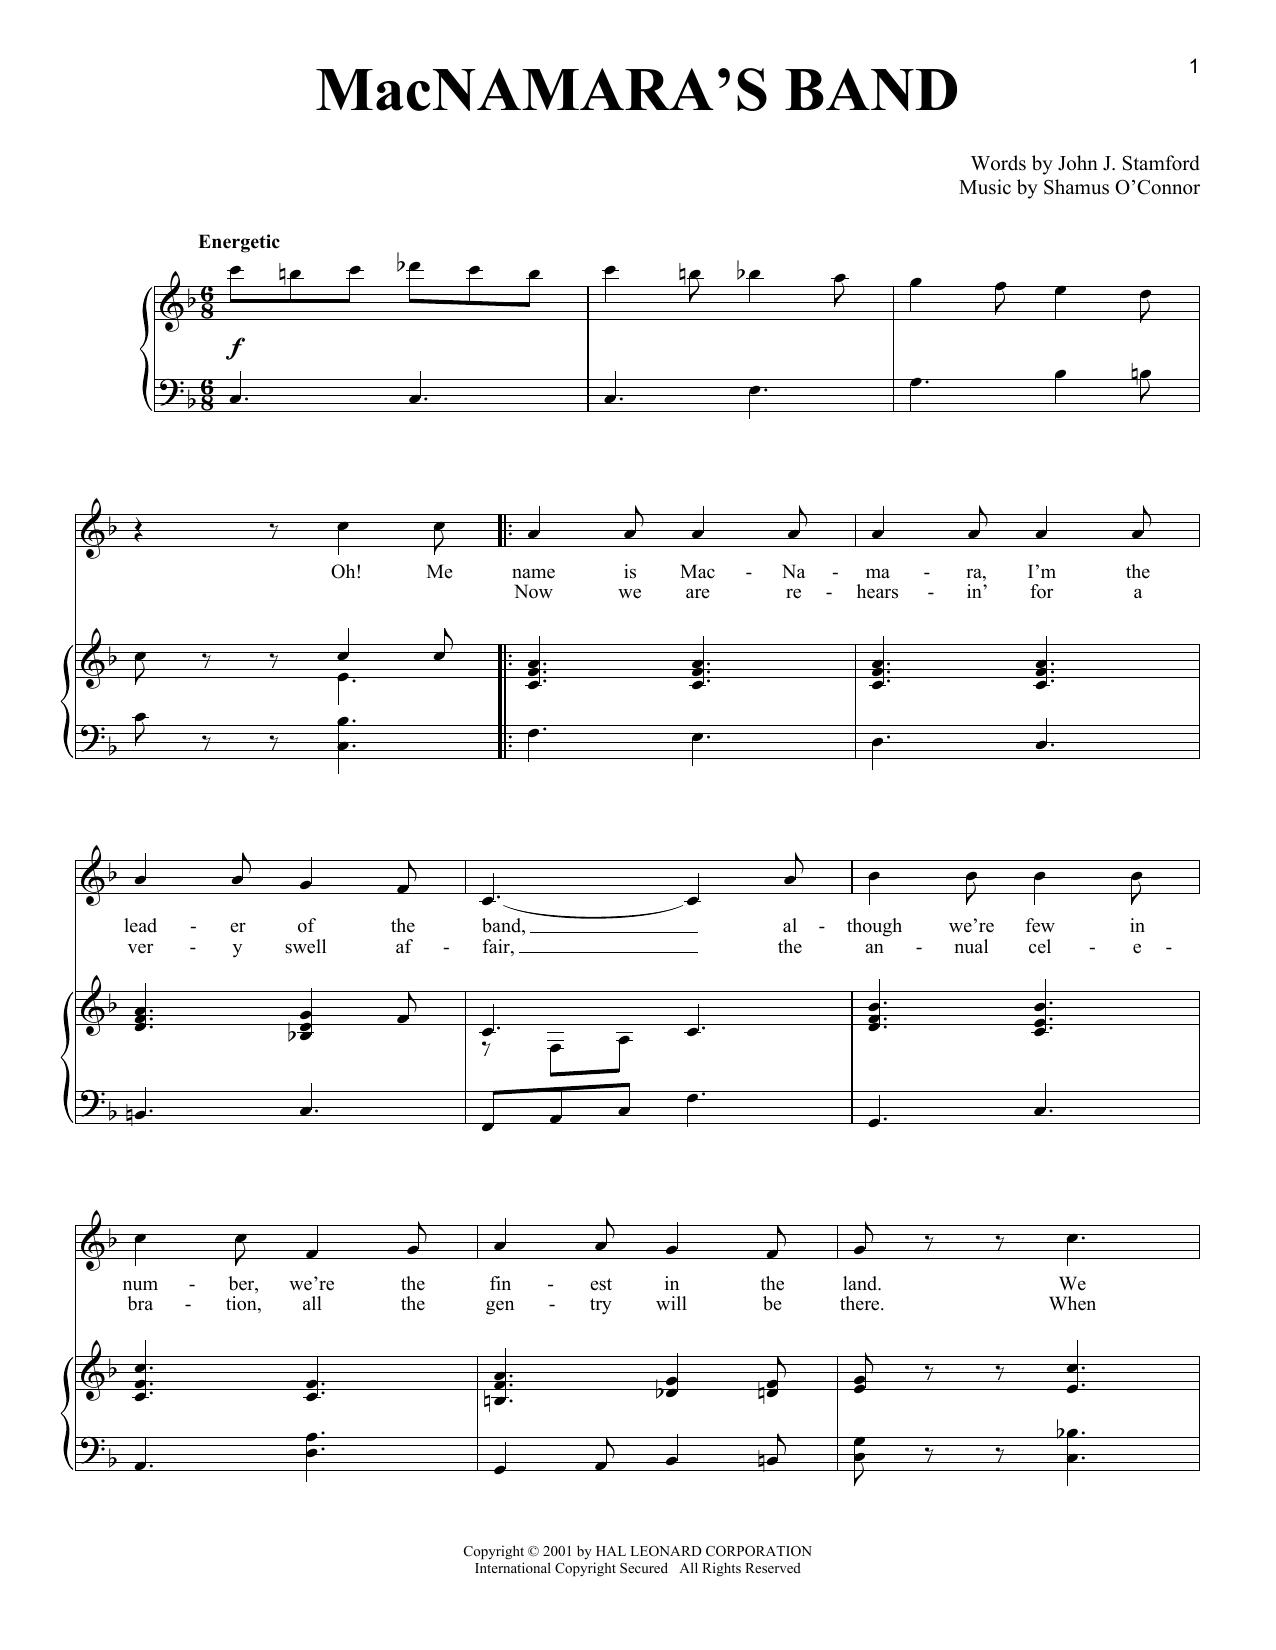 MacNamara's Band (Piano & Vocal)